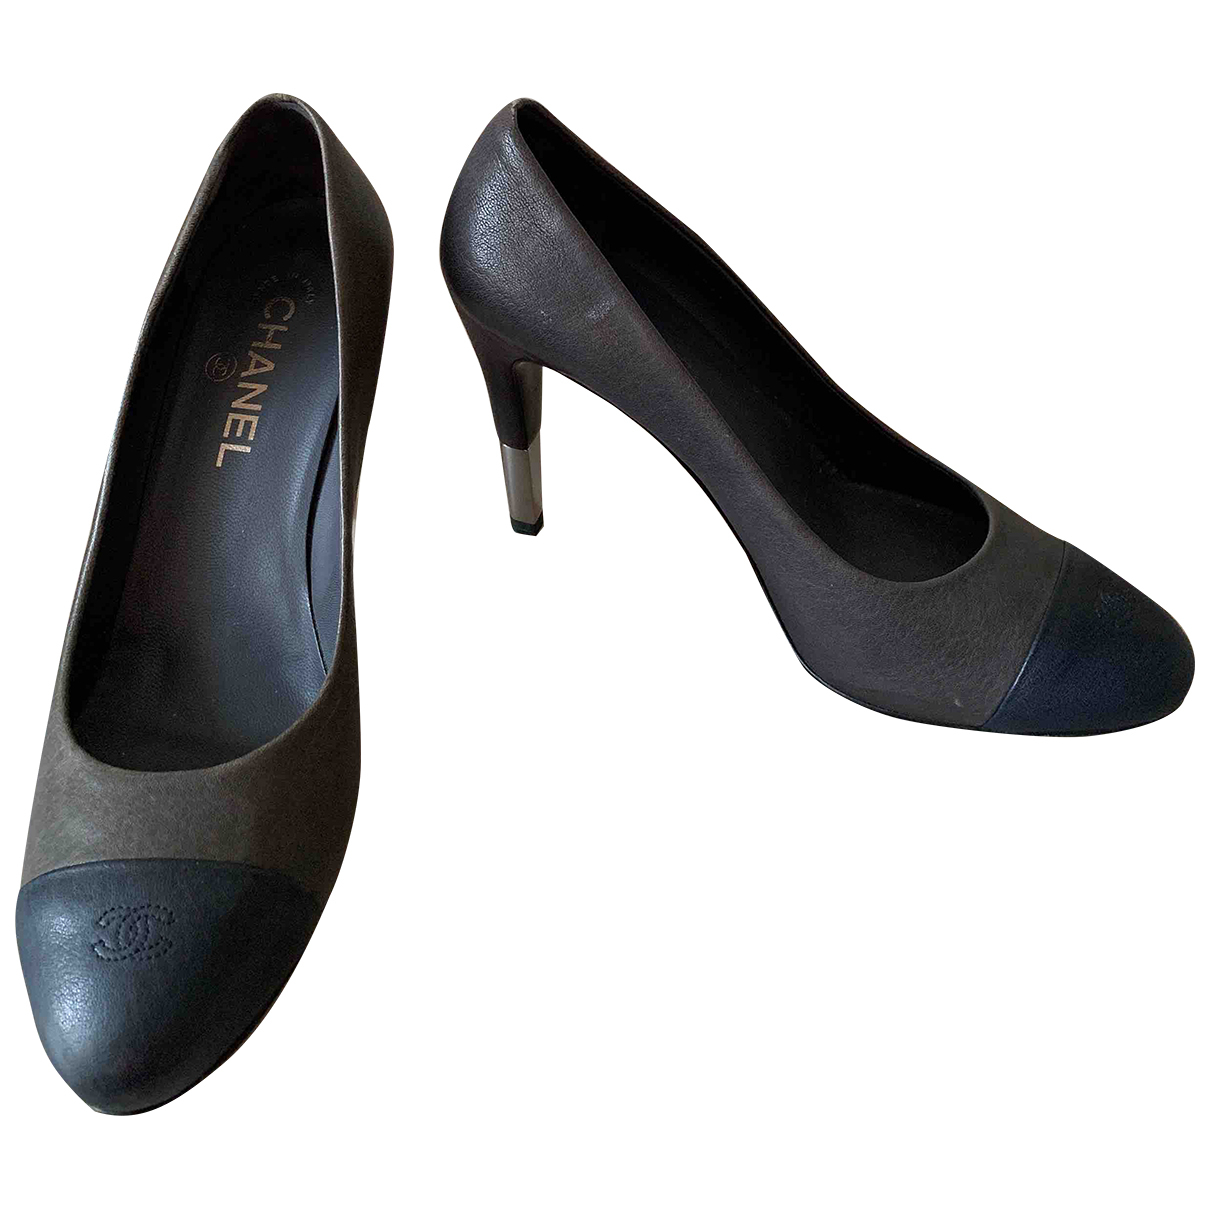 Chanel N Multicolour Leather Heels for Women 39.5 EU